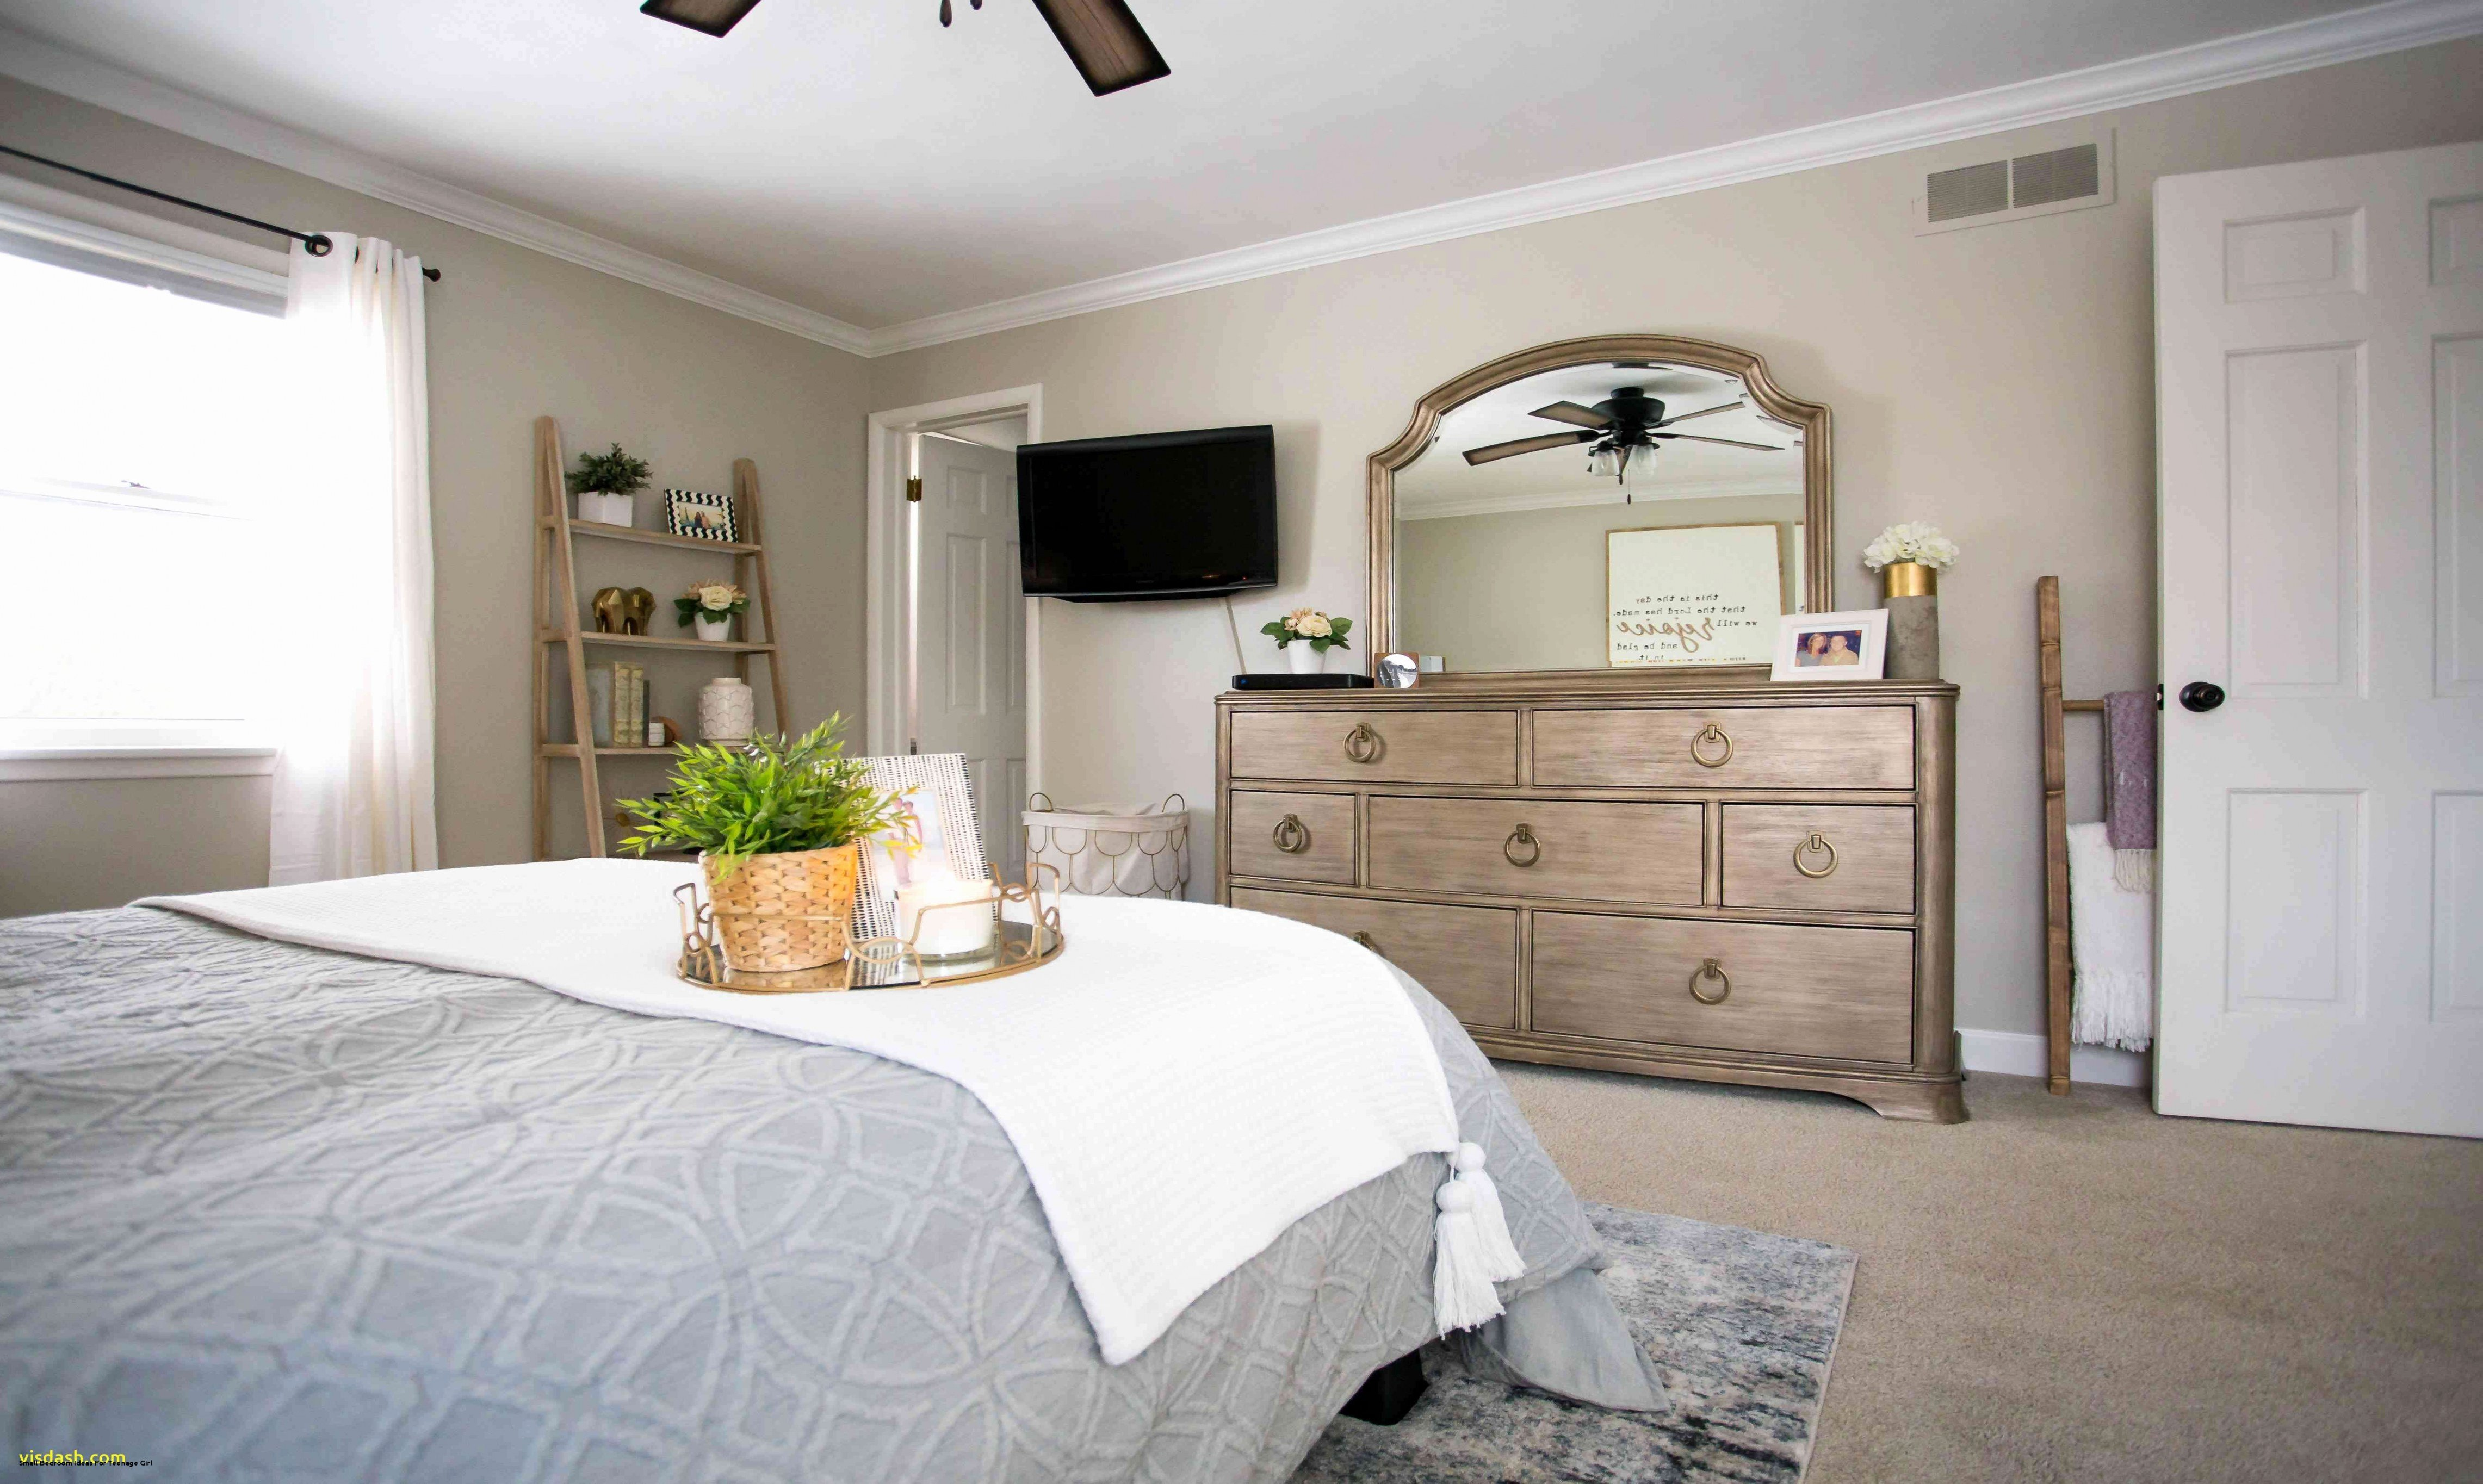 Girl Bedroom Set Full Awesome Teen Girls Bedroom Ideas 49 Inspirational Bedroom Ideas for